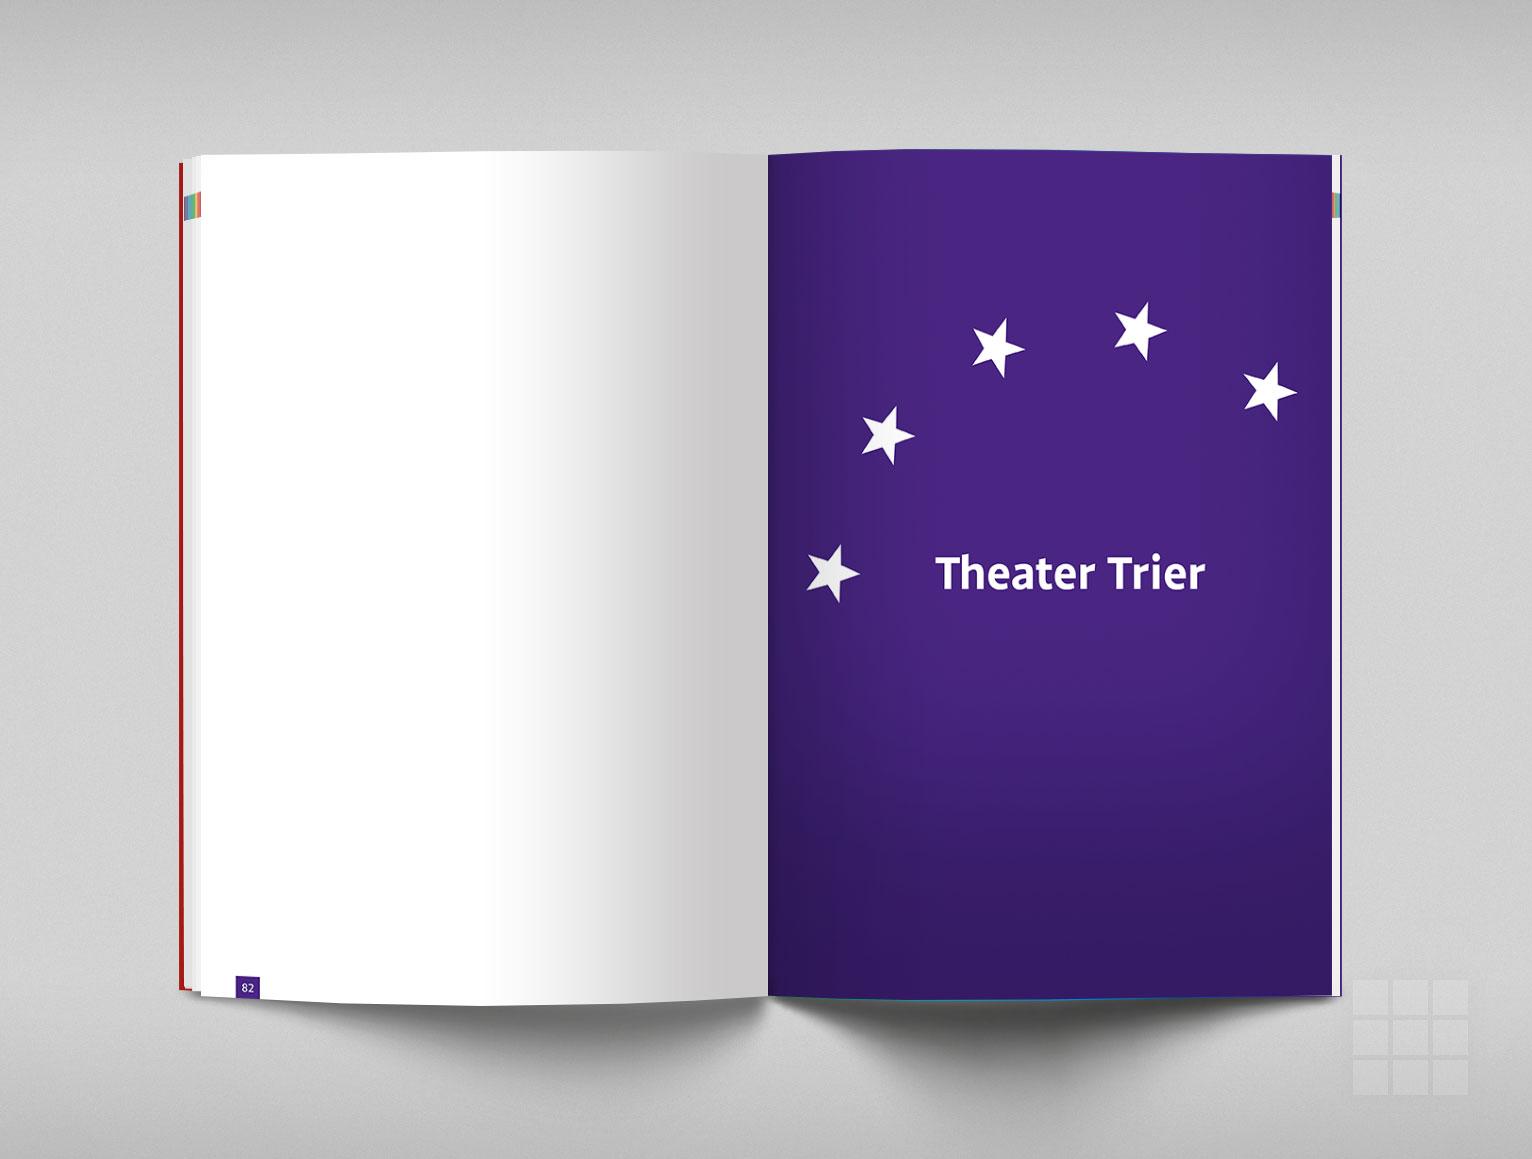 Kapitelbeginn Theater Trier - Kulturbericht Stadt Trier